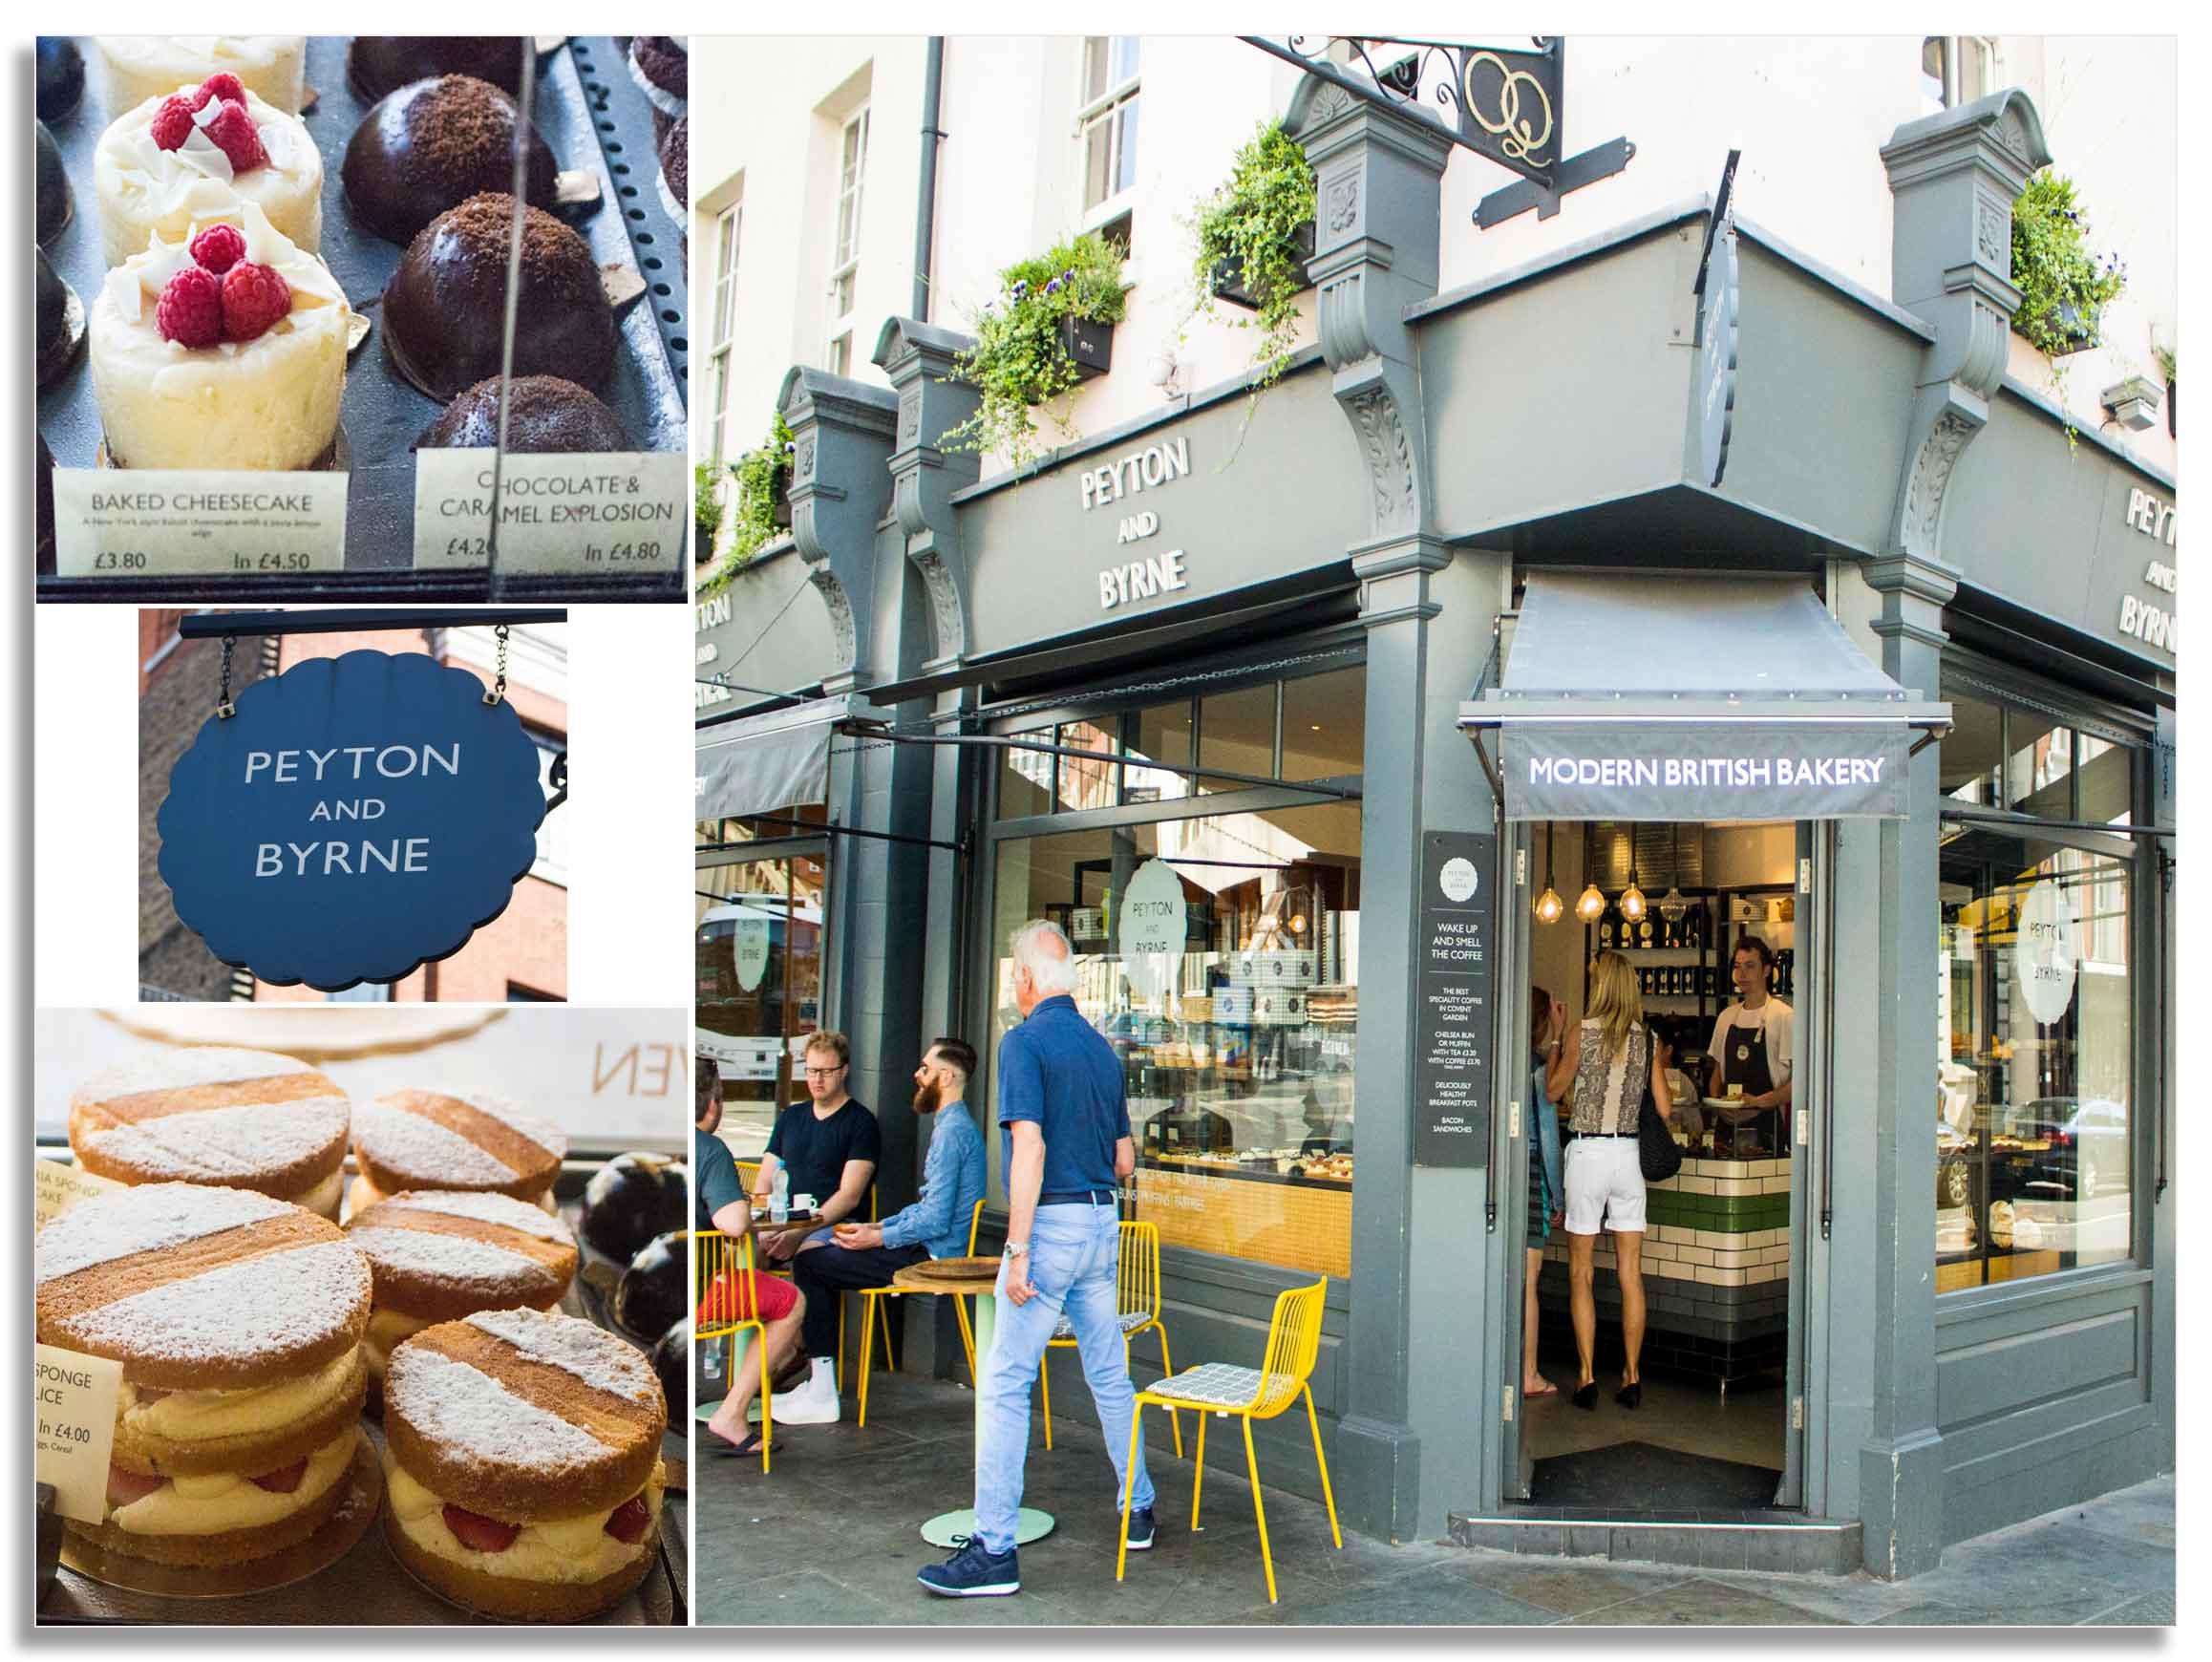 Peyton & Byrne London|foodandjourneys.net